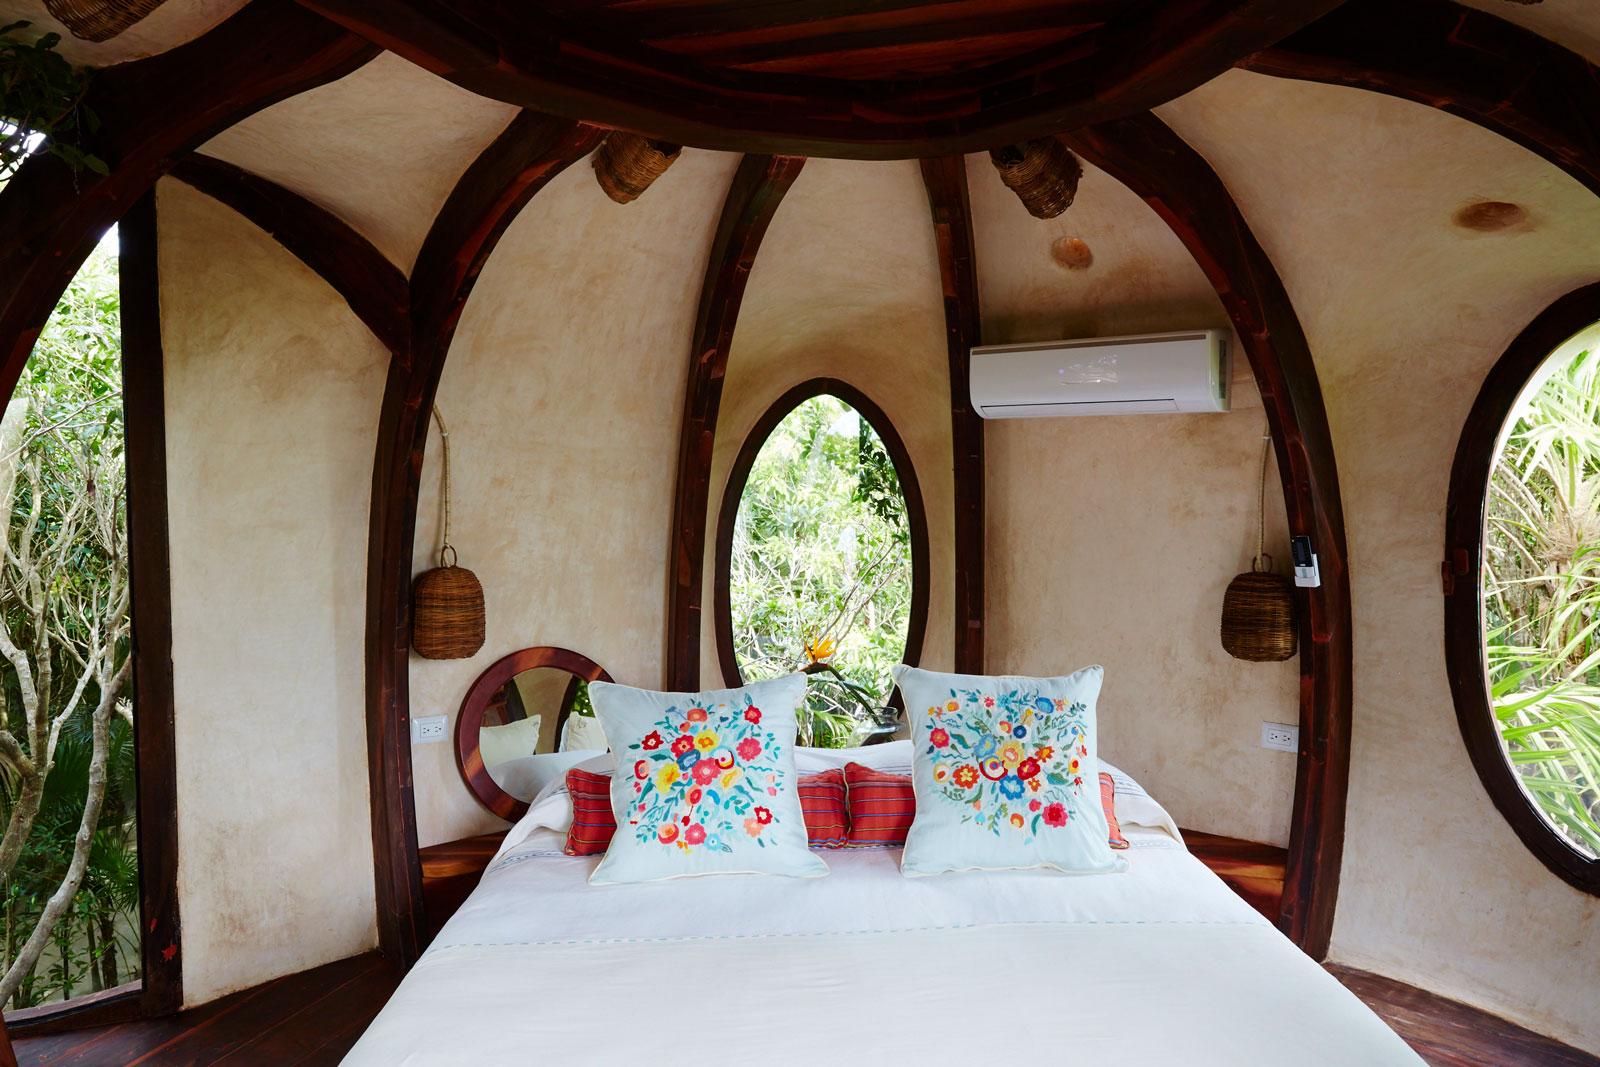 Maya_Luxe_Riviera_Maya_Luxury_Villas_Experiences_Tulum_Hotel_Zone_1_Bedroom_Jungle_House_7 (1).jpg